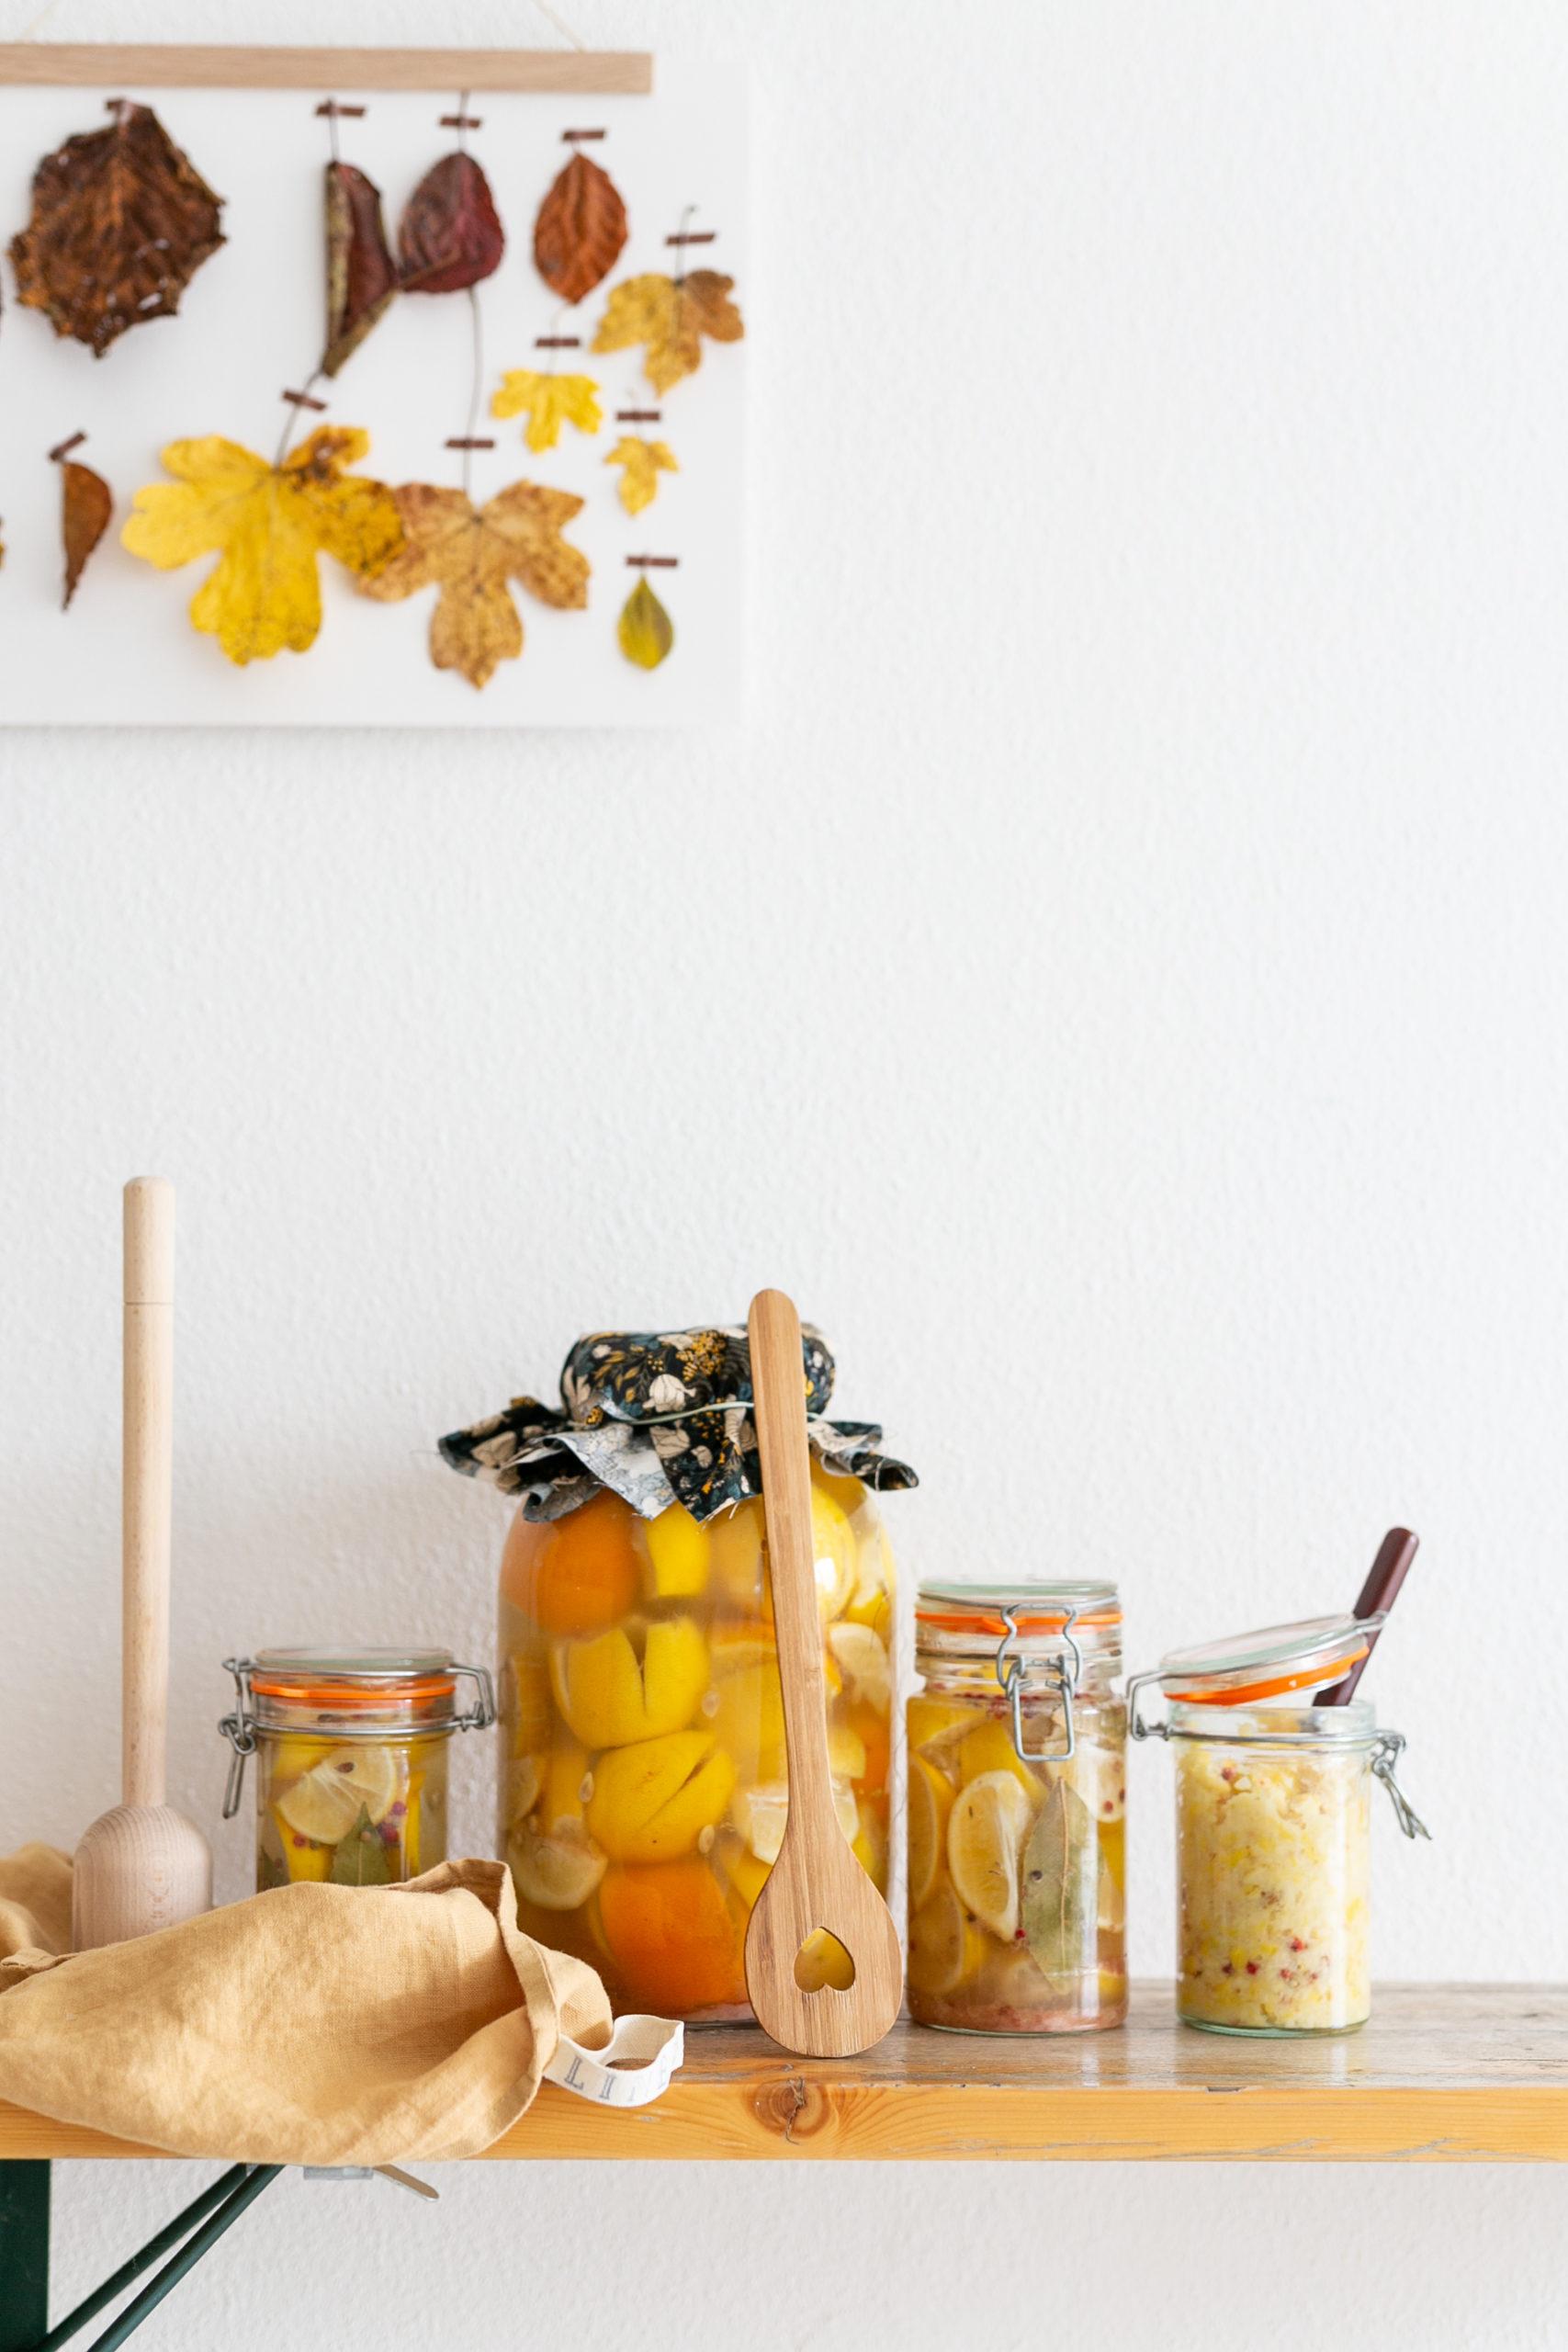 Fermentation Workshops | Gesunde vegane Rezepte, Fermentation, Nachhaltigkeit - Syl Gervais